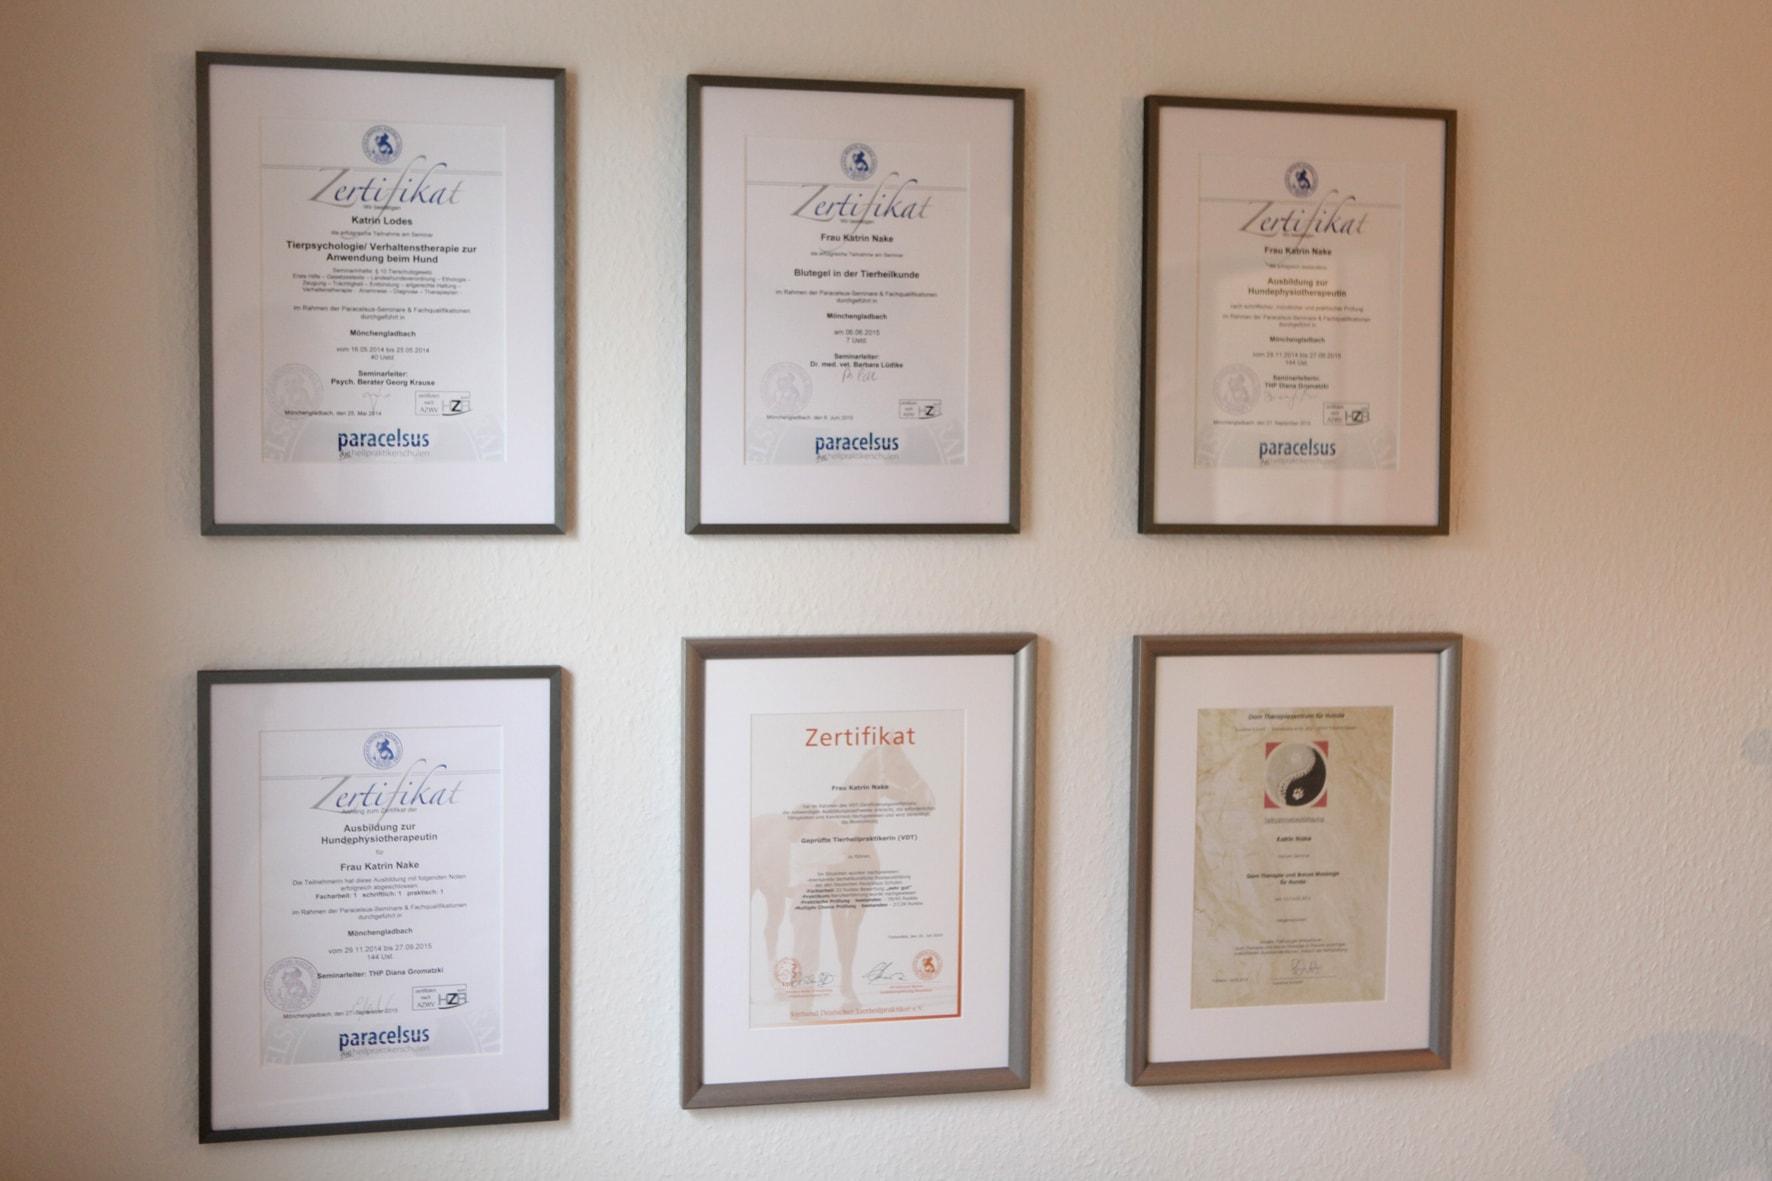 Hundephysiotherapie Zertifikate